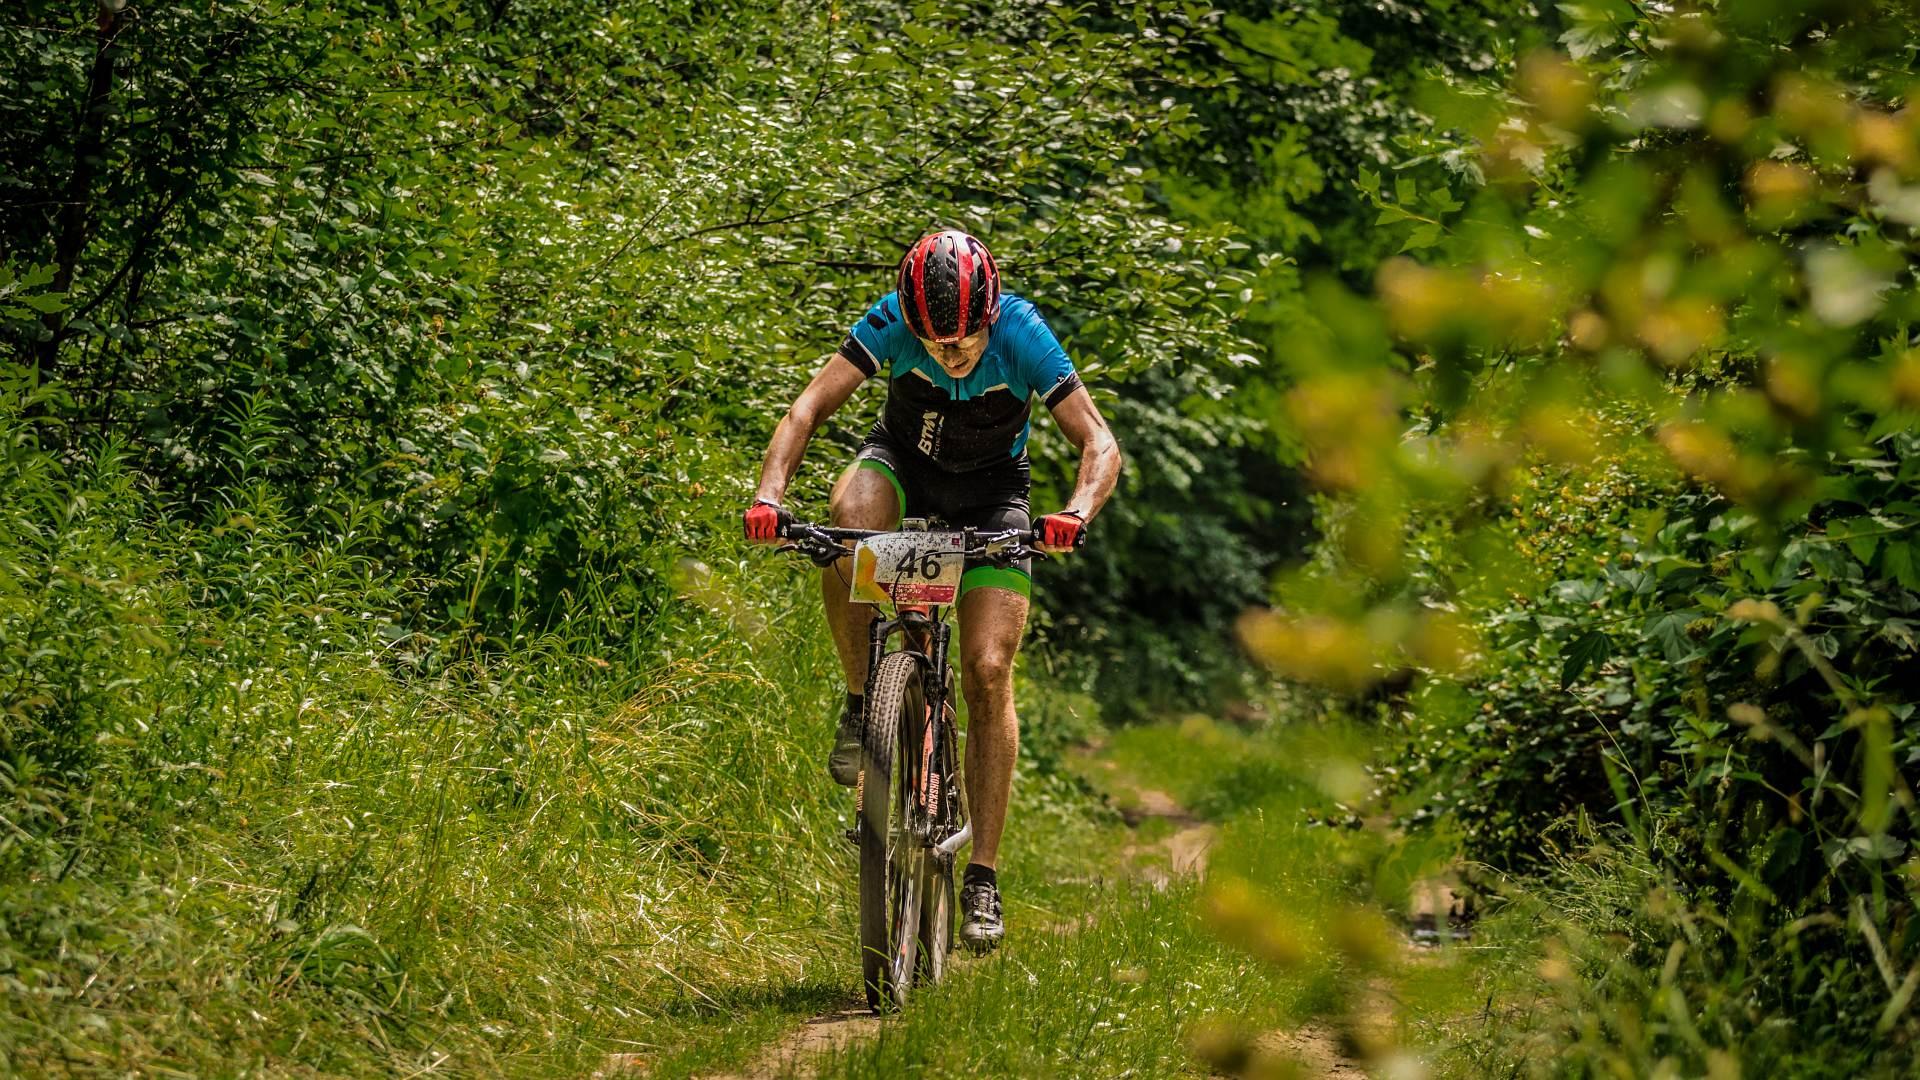 wyscig-rowerow-gorskich-0100